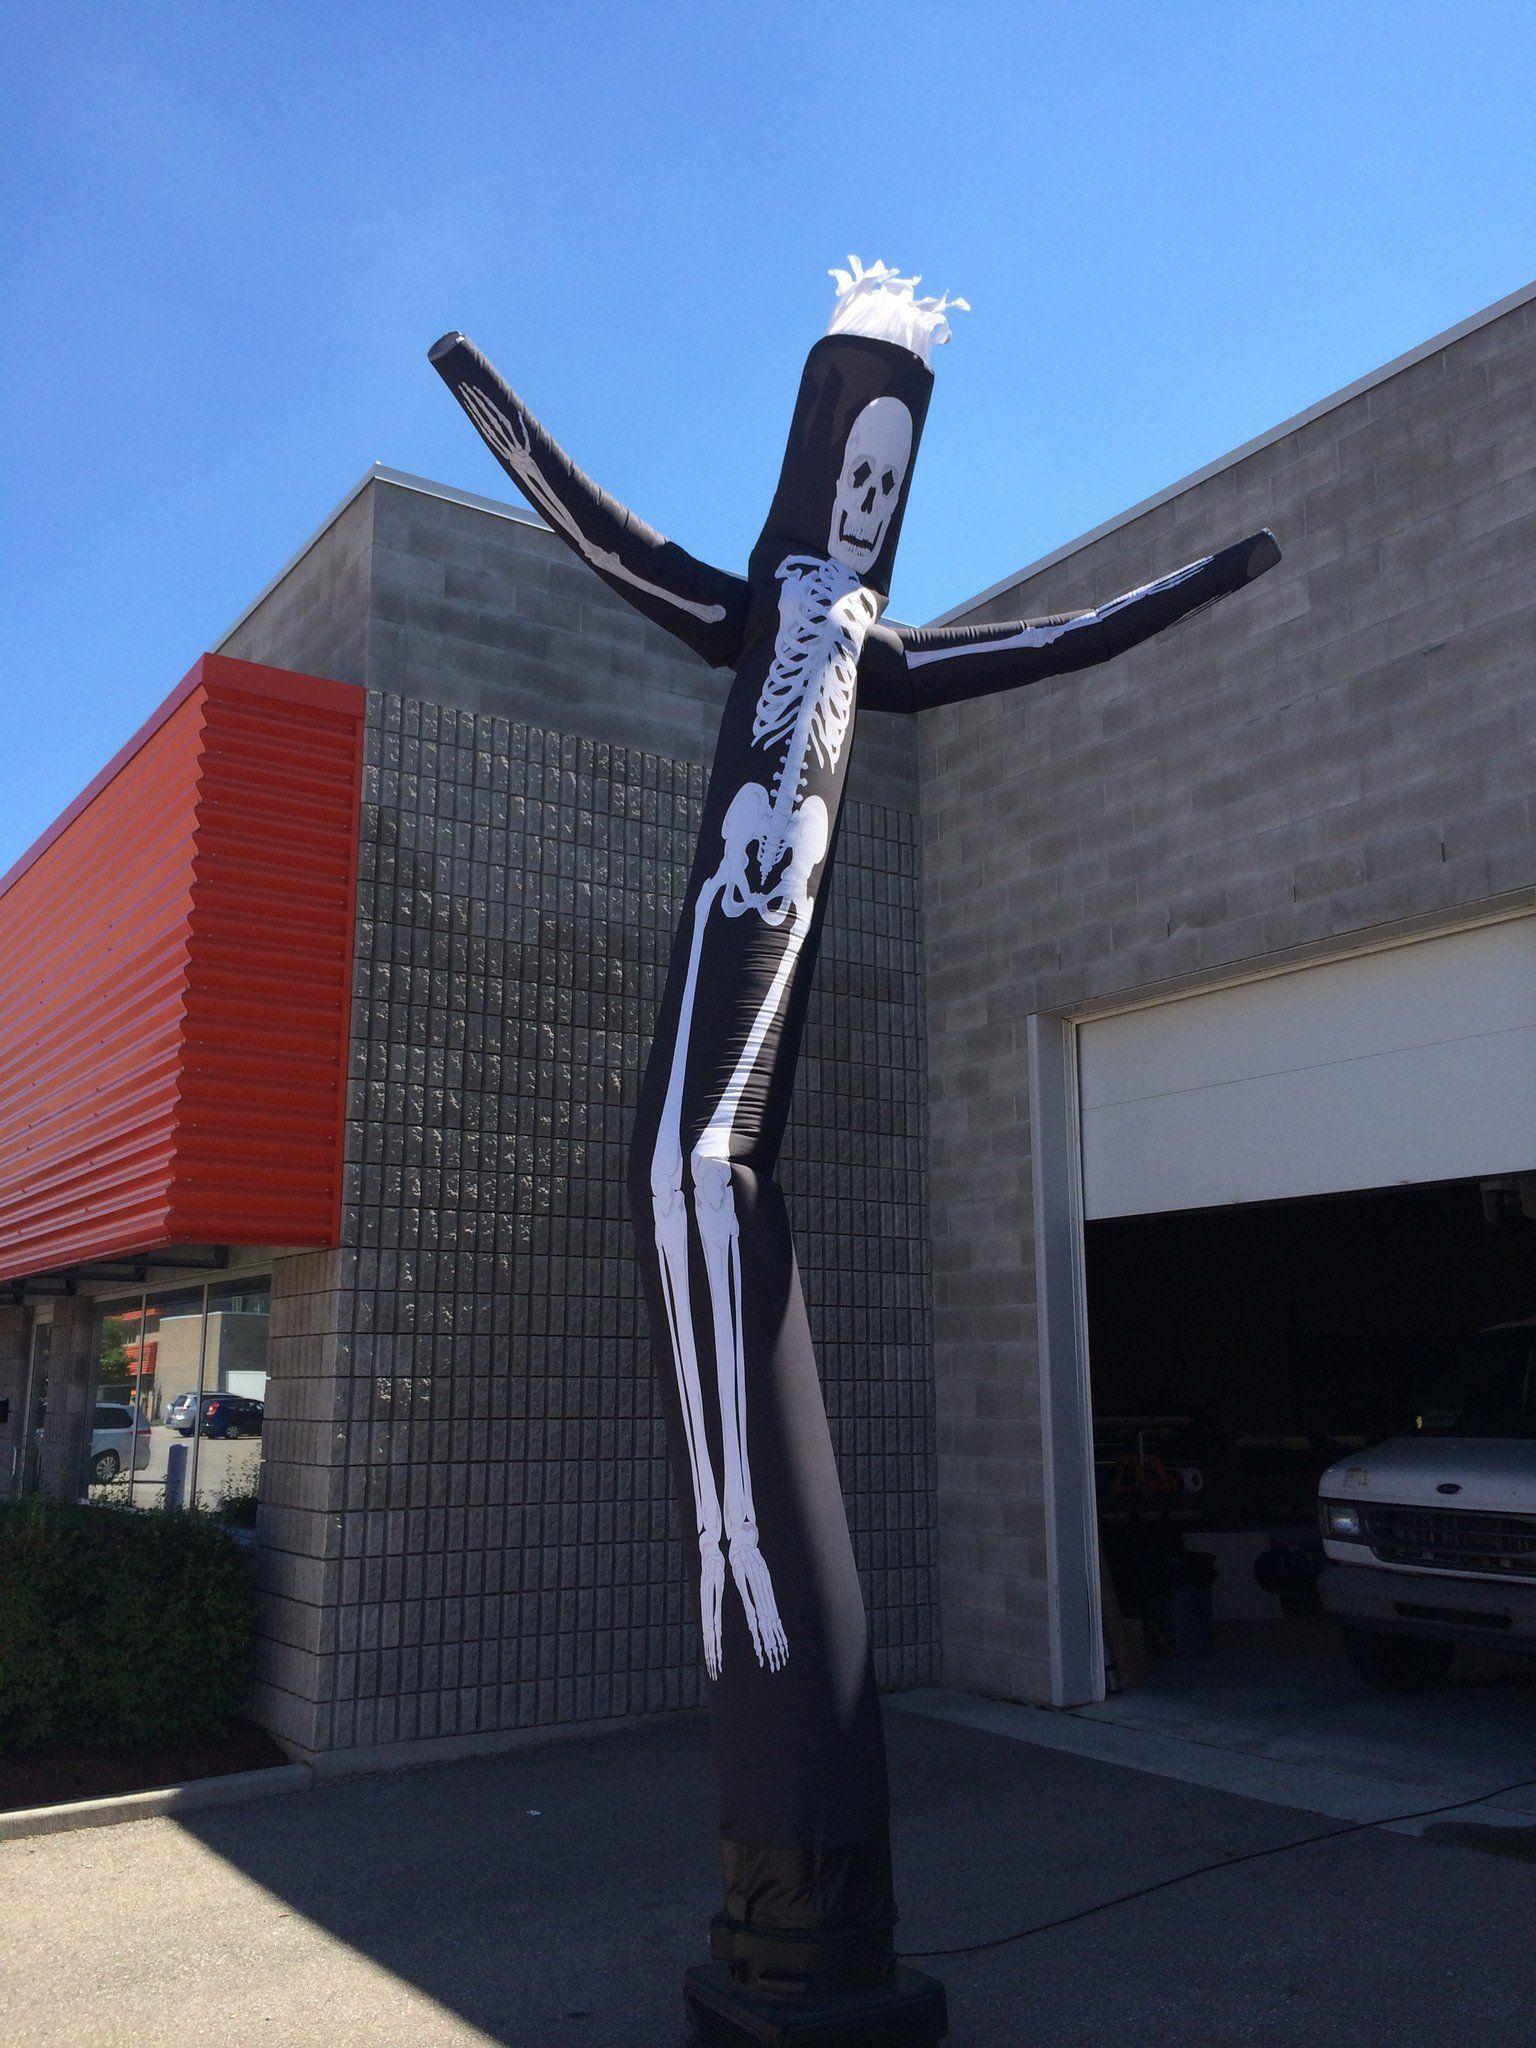 Custom Air Dancers Sky Dancers Inflatable Tube Man Dancing Tubes Outdoor Inflatables Inflatable Dancer